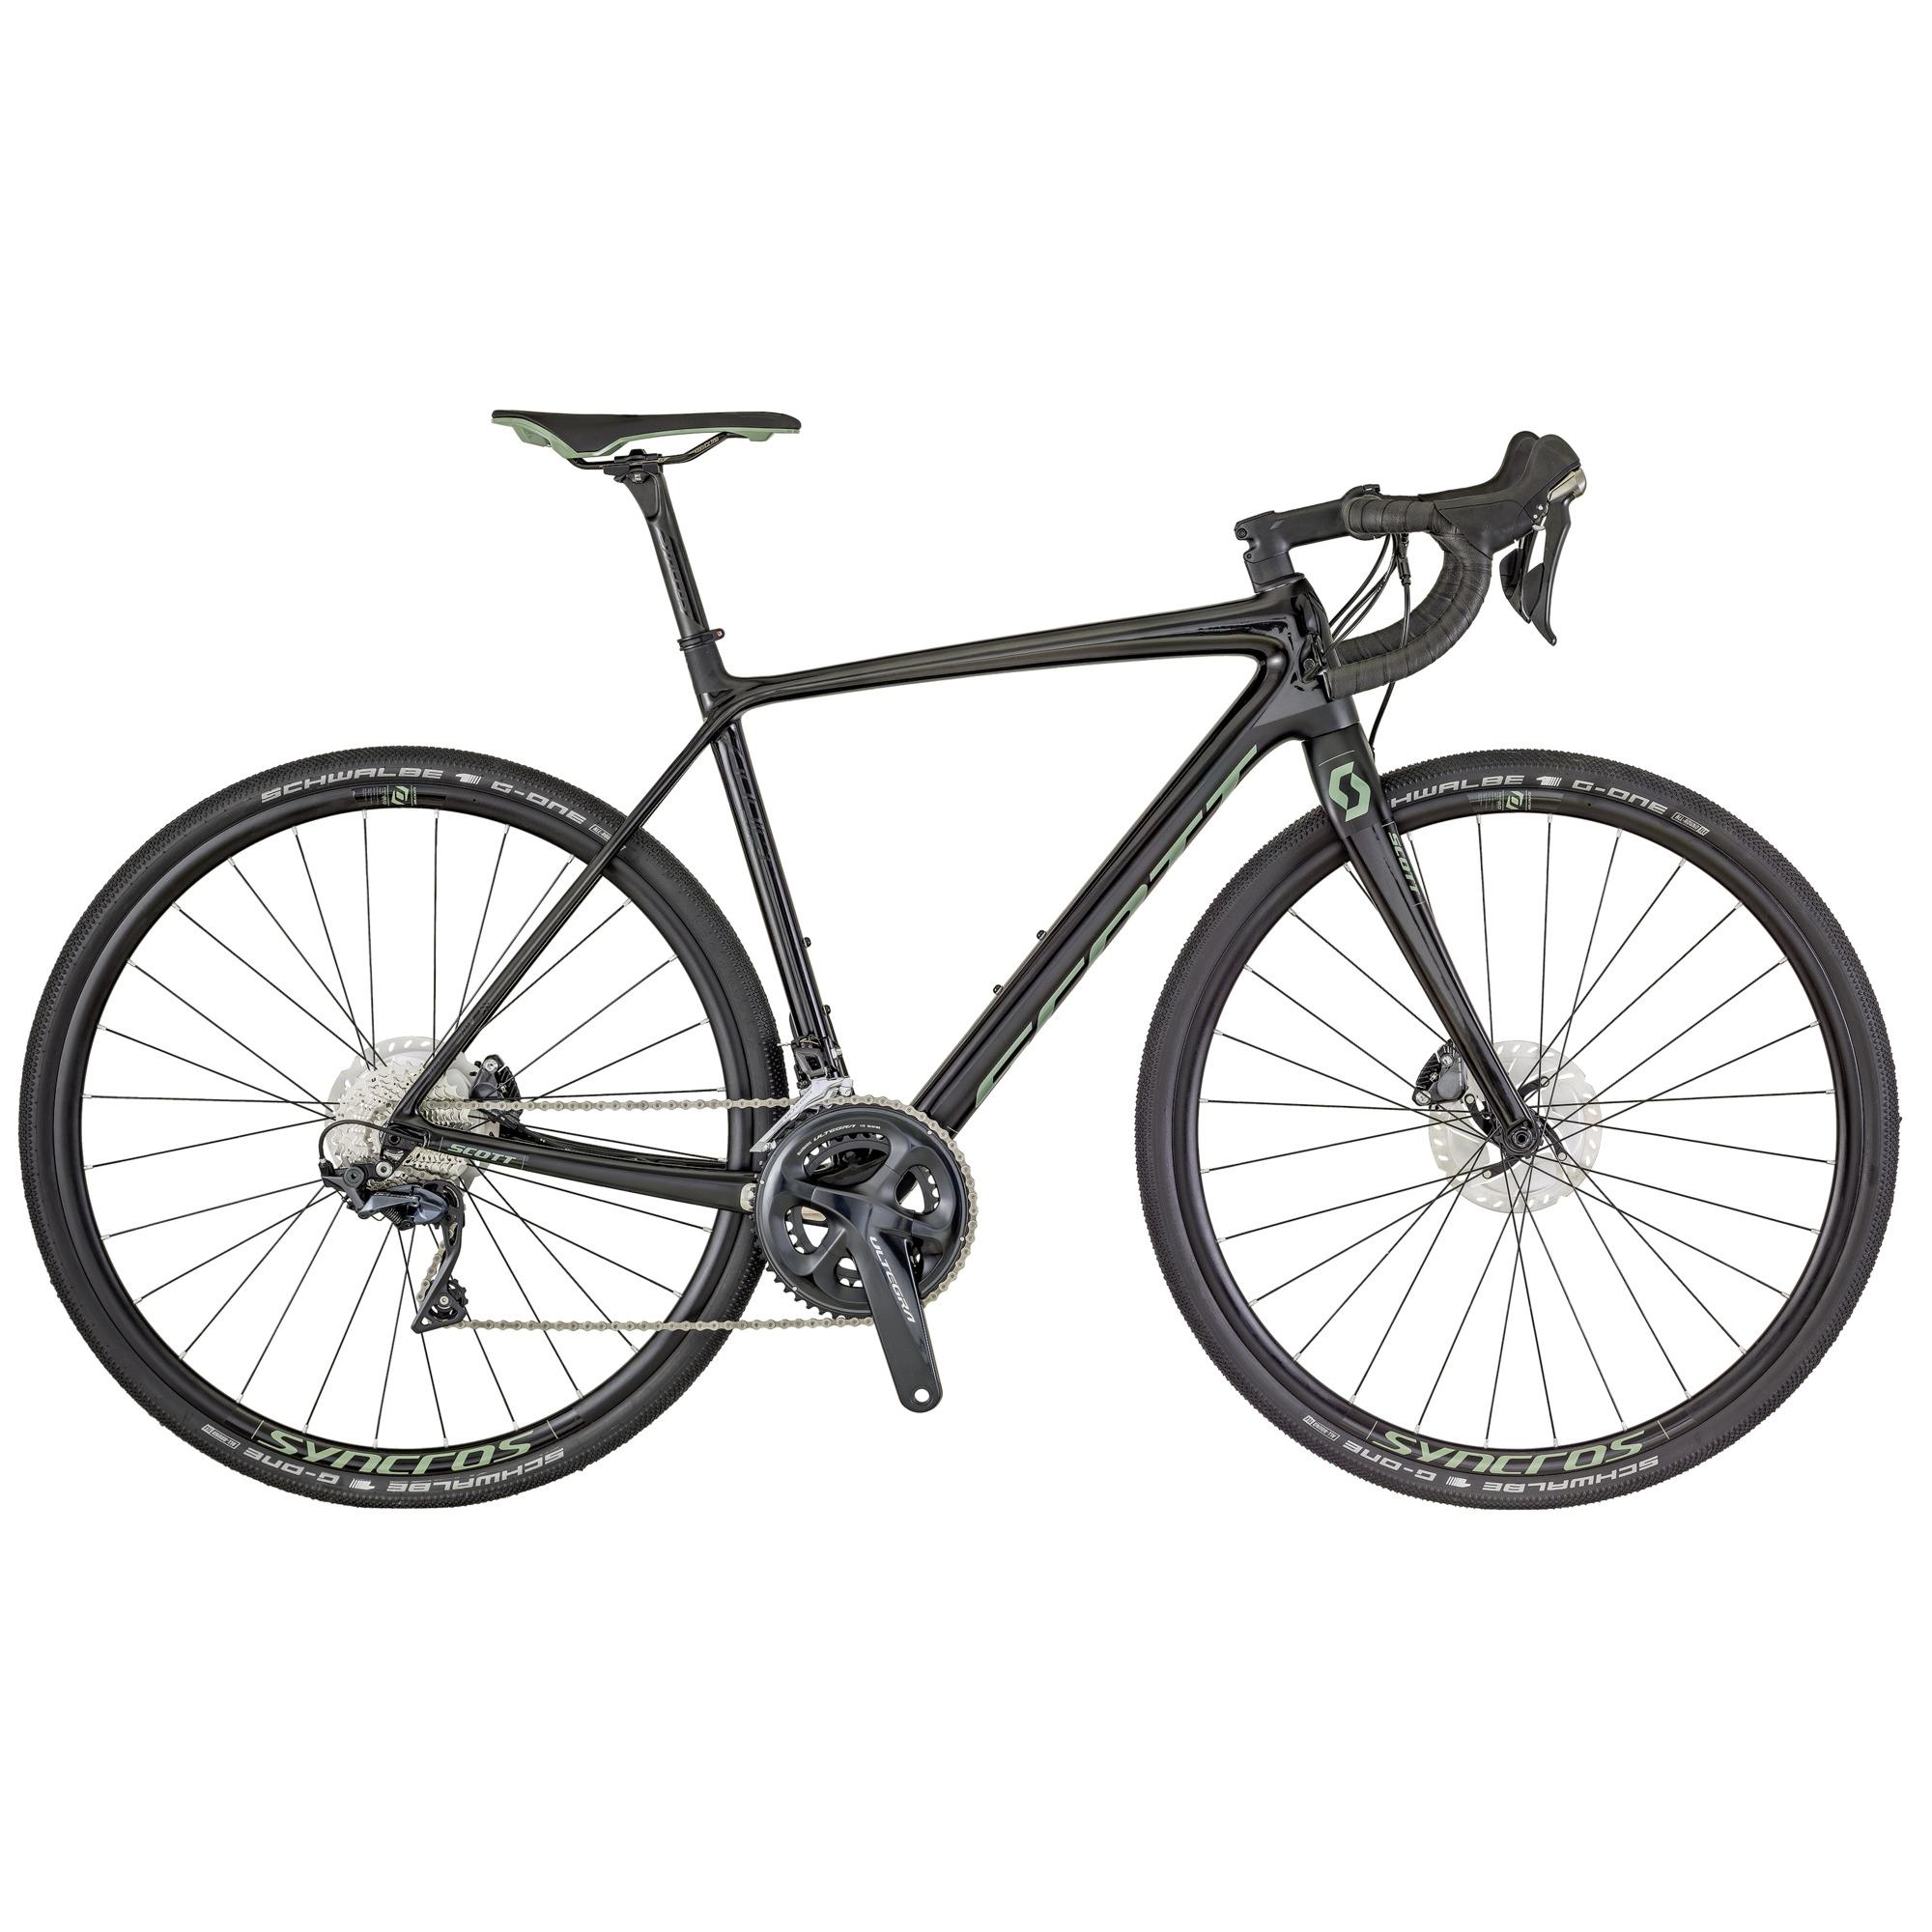 SCOTT Addict Gravel 20 Disc Bike L56 - Zweirad Homann